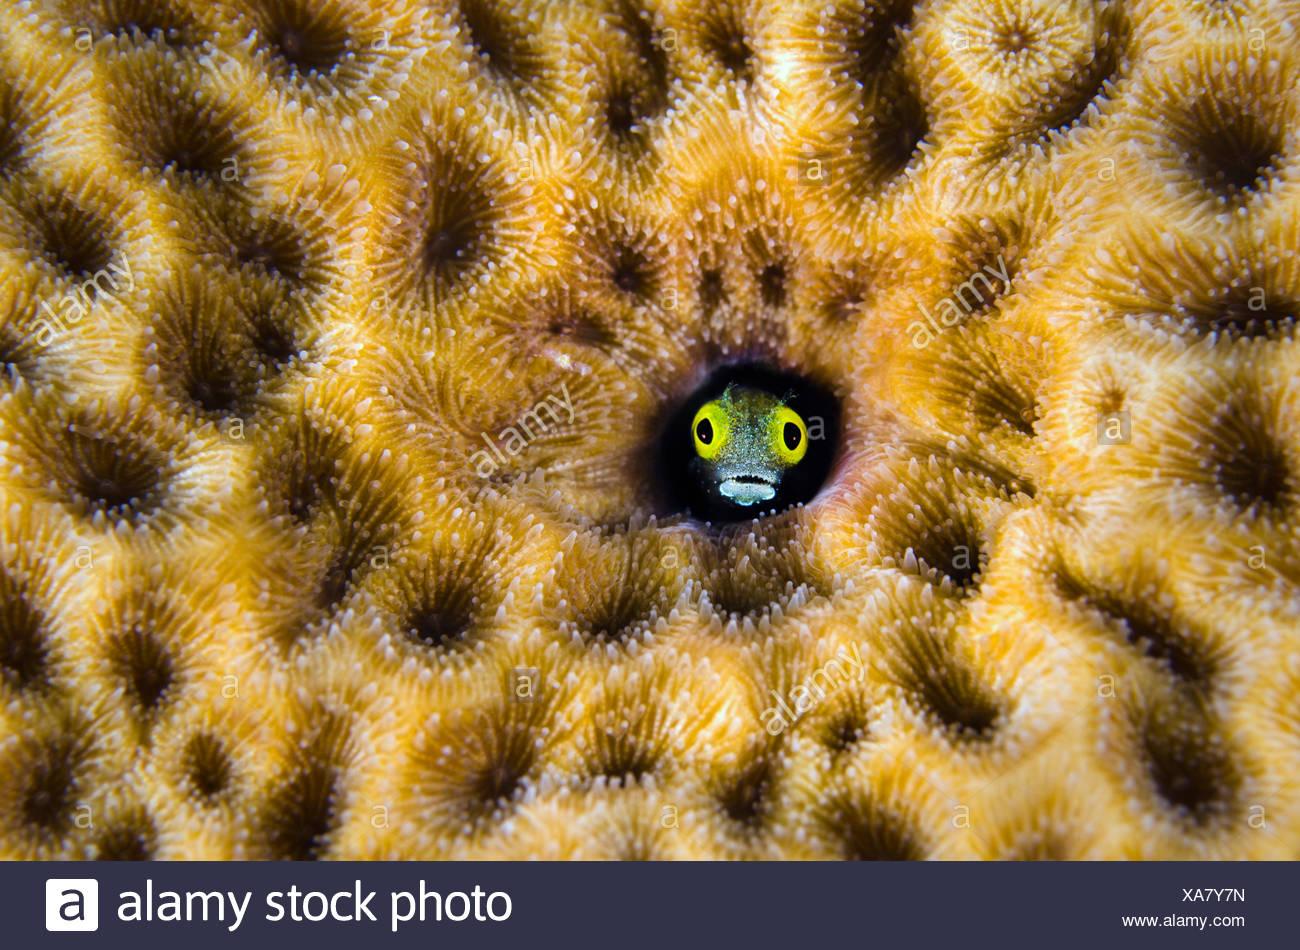 (Blennies Secrétaire Acanthemblemaria maria) pairs hors de son trou dans une starlette massive coral (Siderastrea siderea) East End, Grand Cayman, Cayman Islands, British West Indies, mer des Caraïbes. Photo Stock